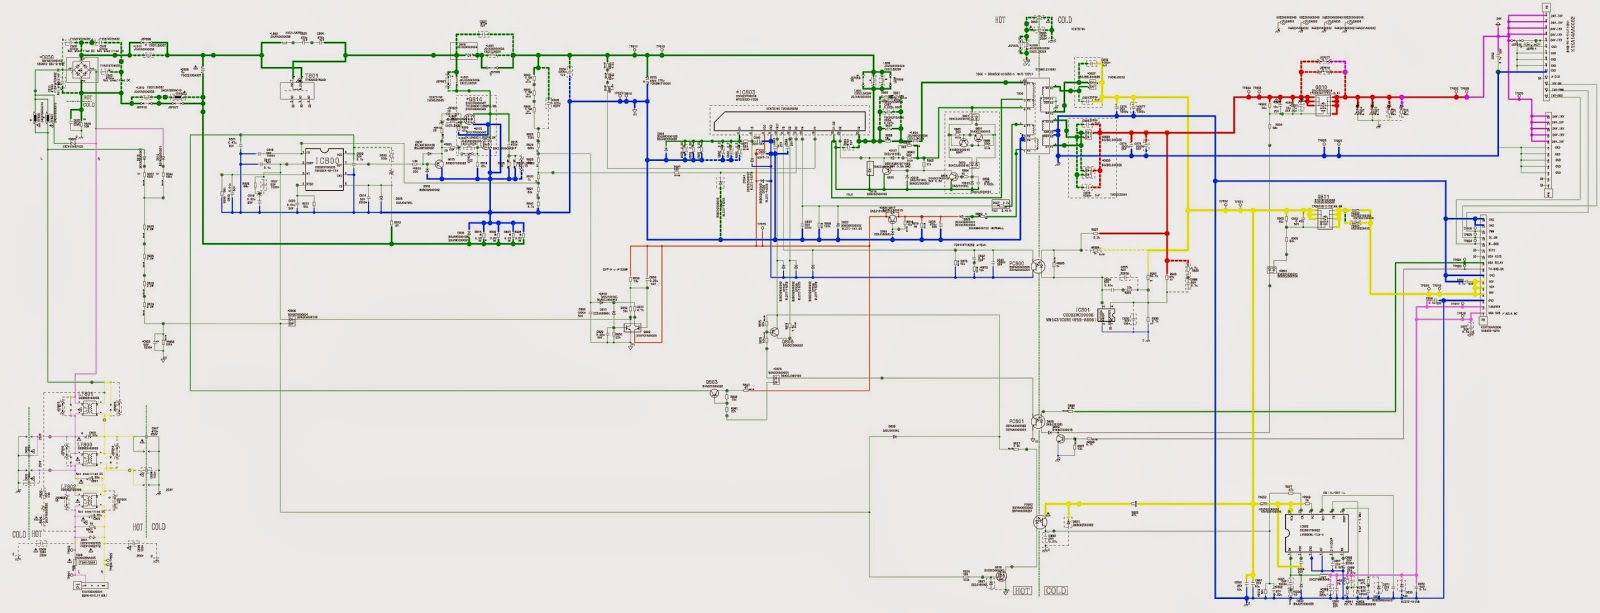 panasonic tc l42u30b lcd tv power supply circuit diagram. Black Bedroom Furniture Sets. Home Design Ideas